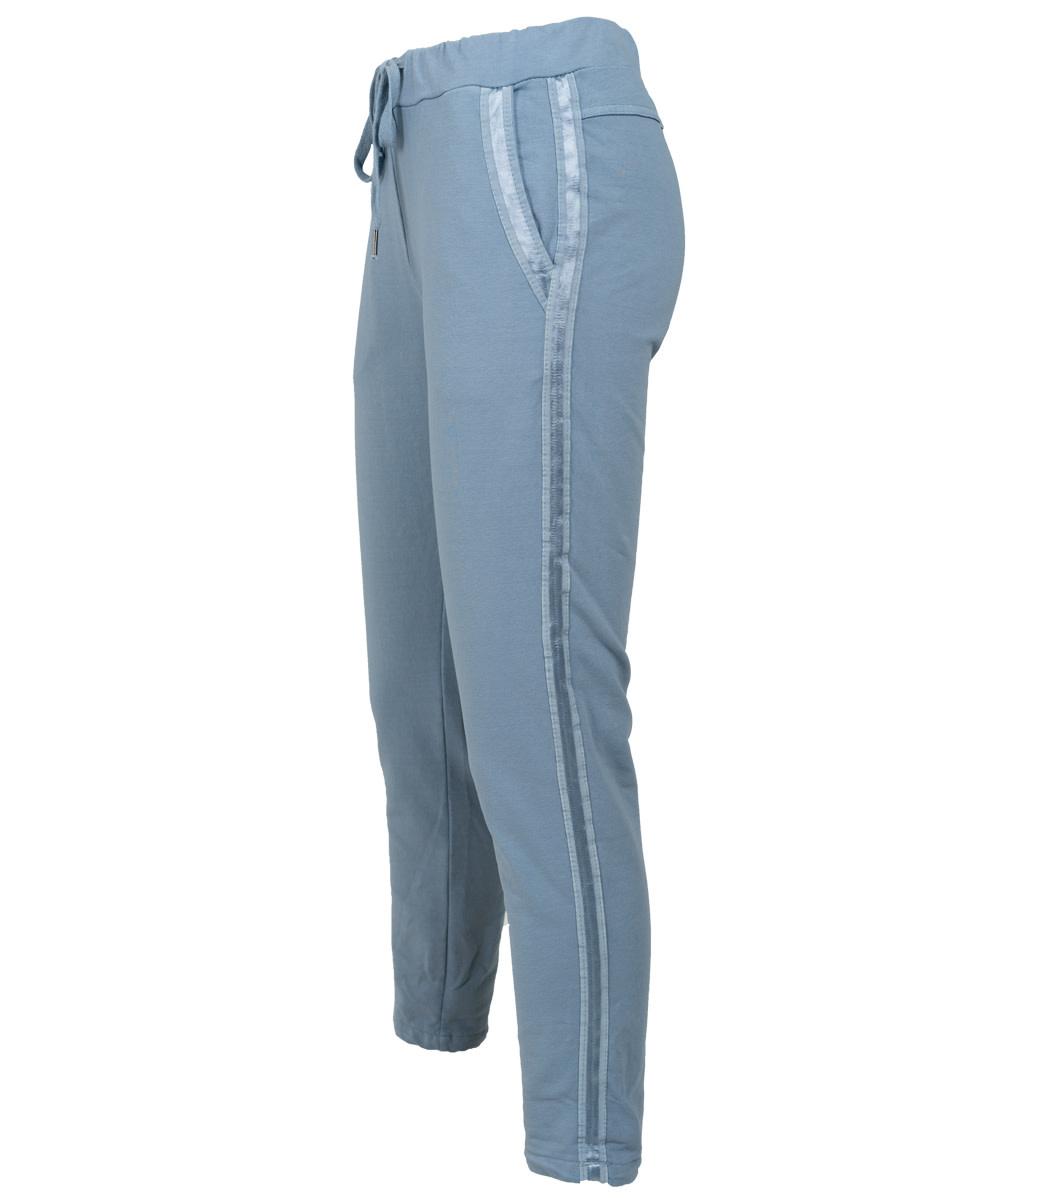 Gemma Ricceri Joggingbroek jeansblauw Marleen